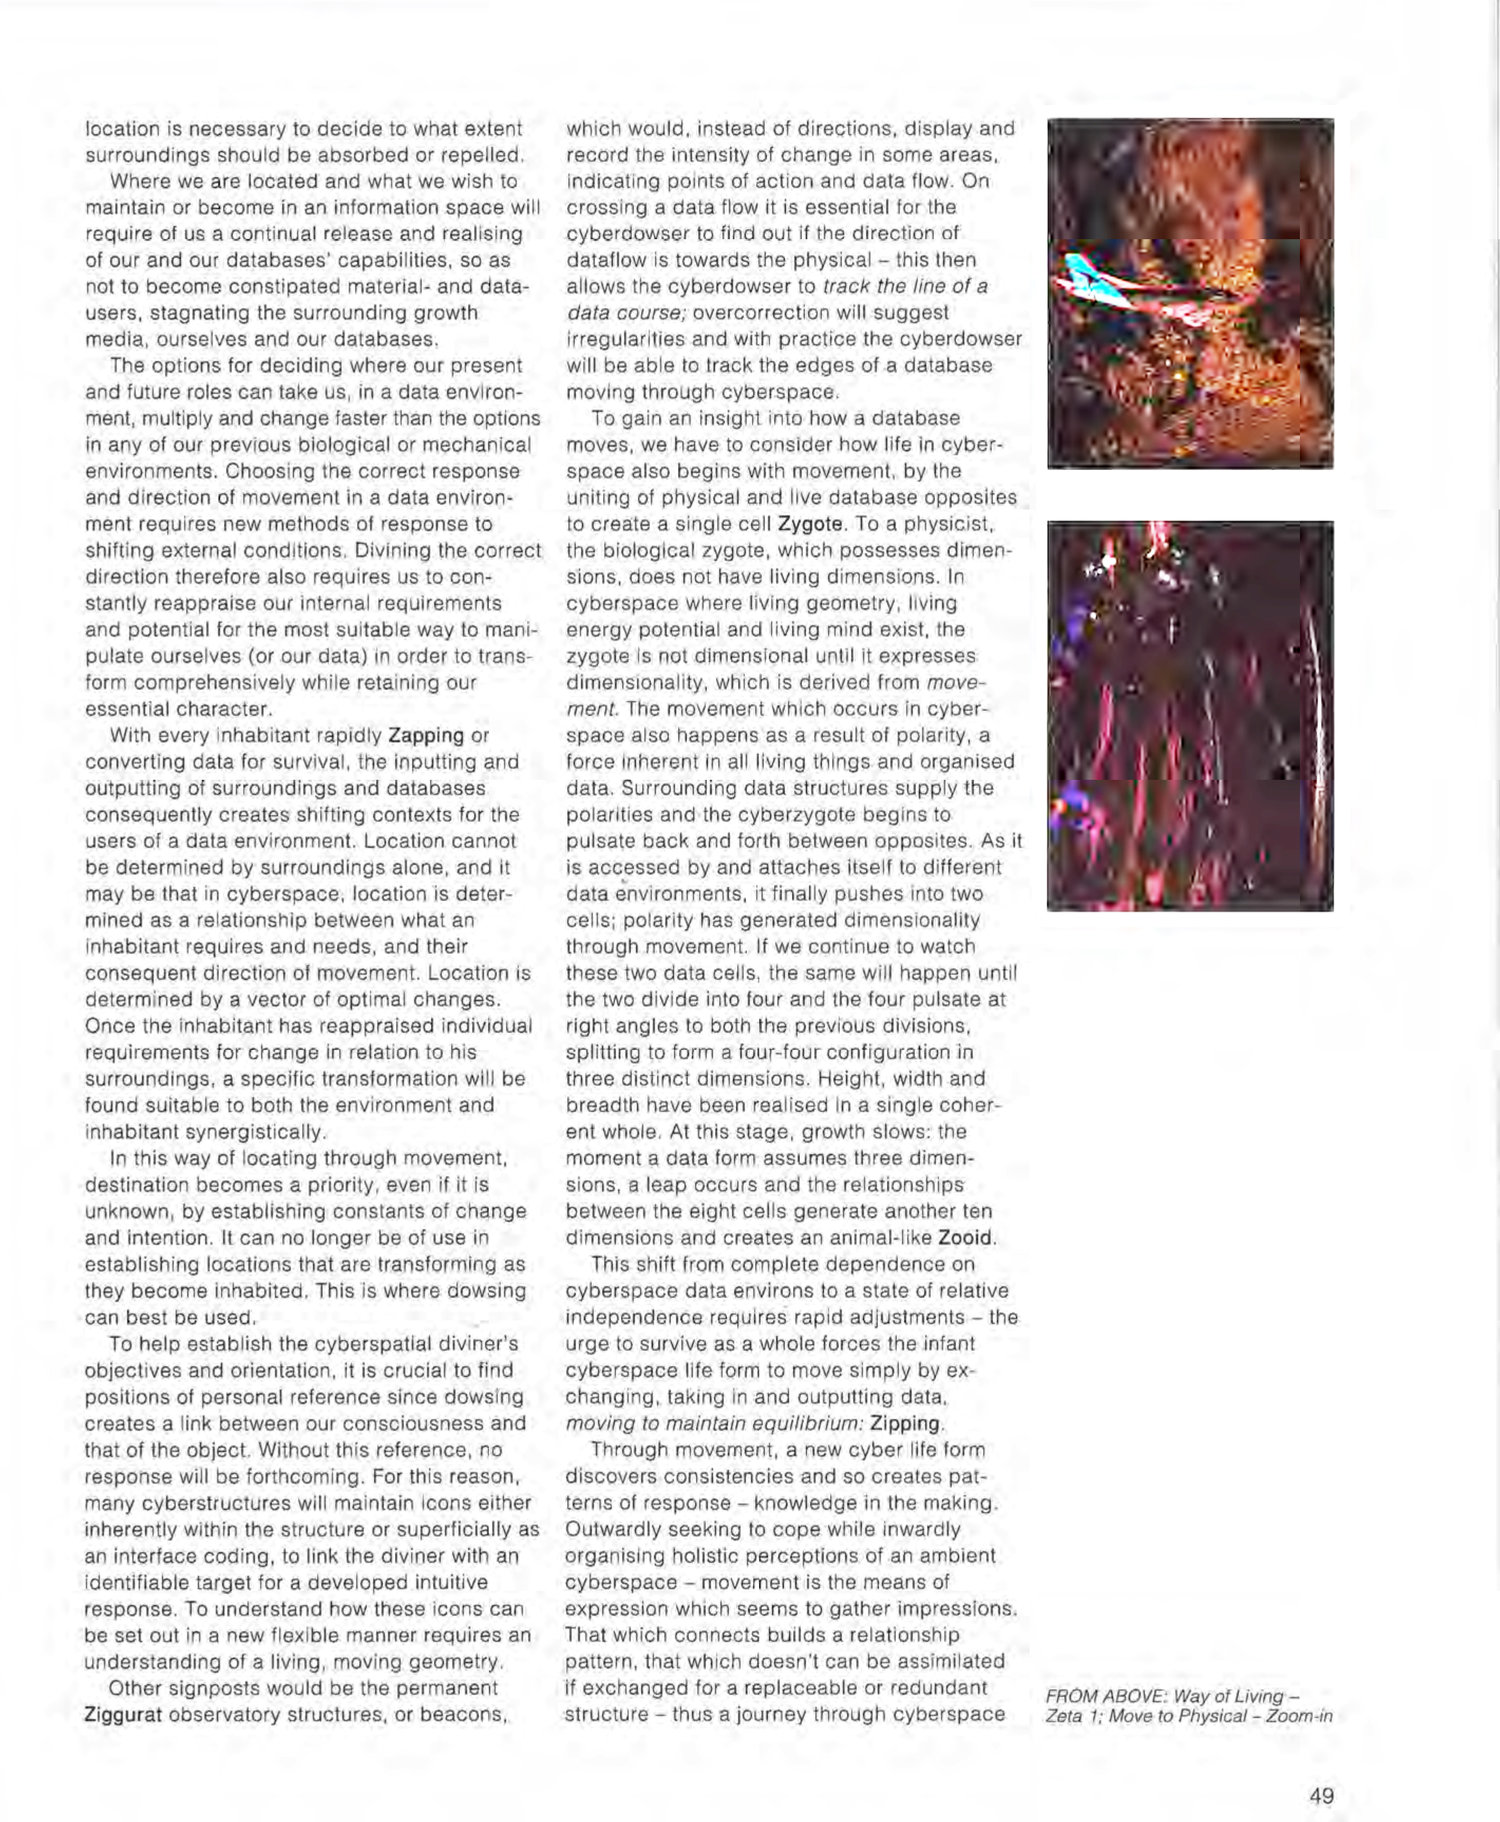 ARCHITECTS+IN+CYBERSPACE_118_Architects_in_Cyberspace_1996+(dragged)+2[1].jpg